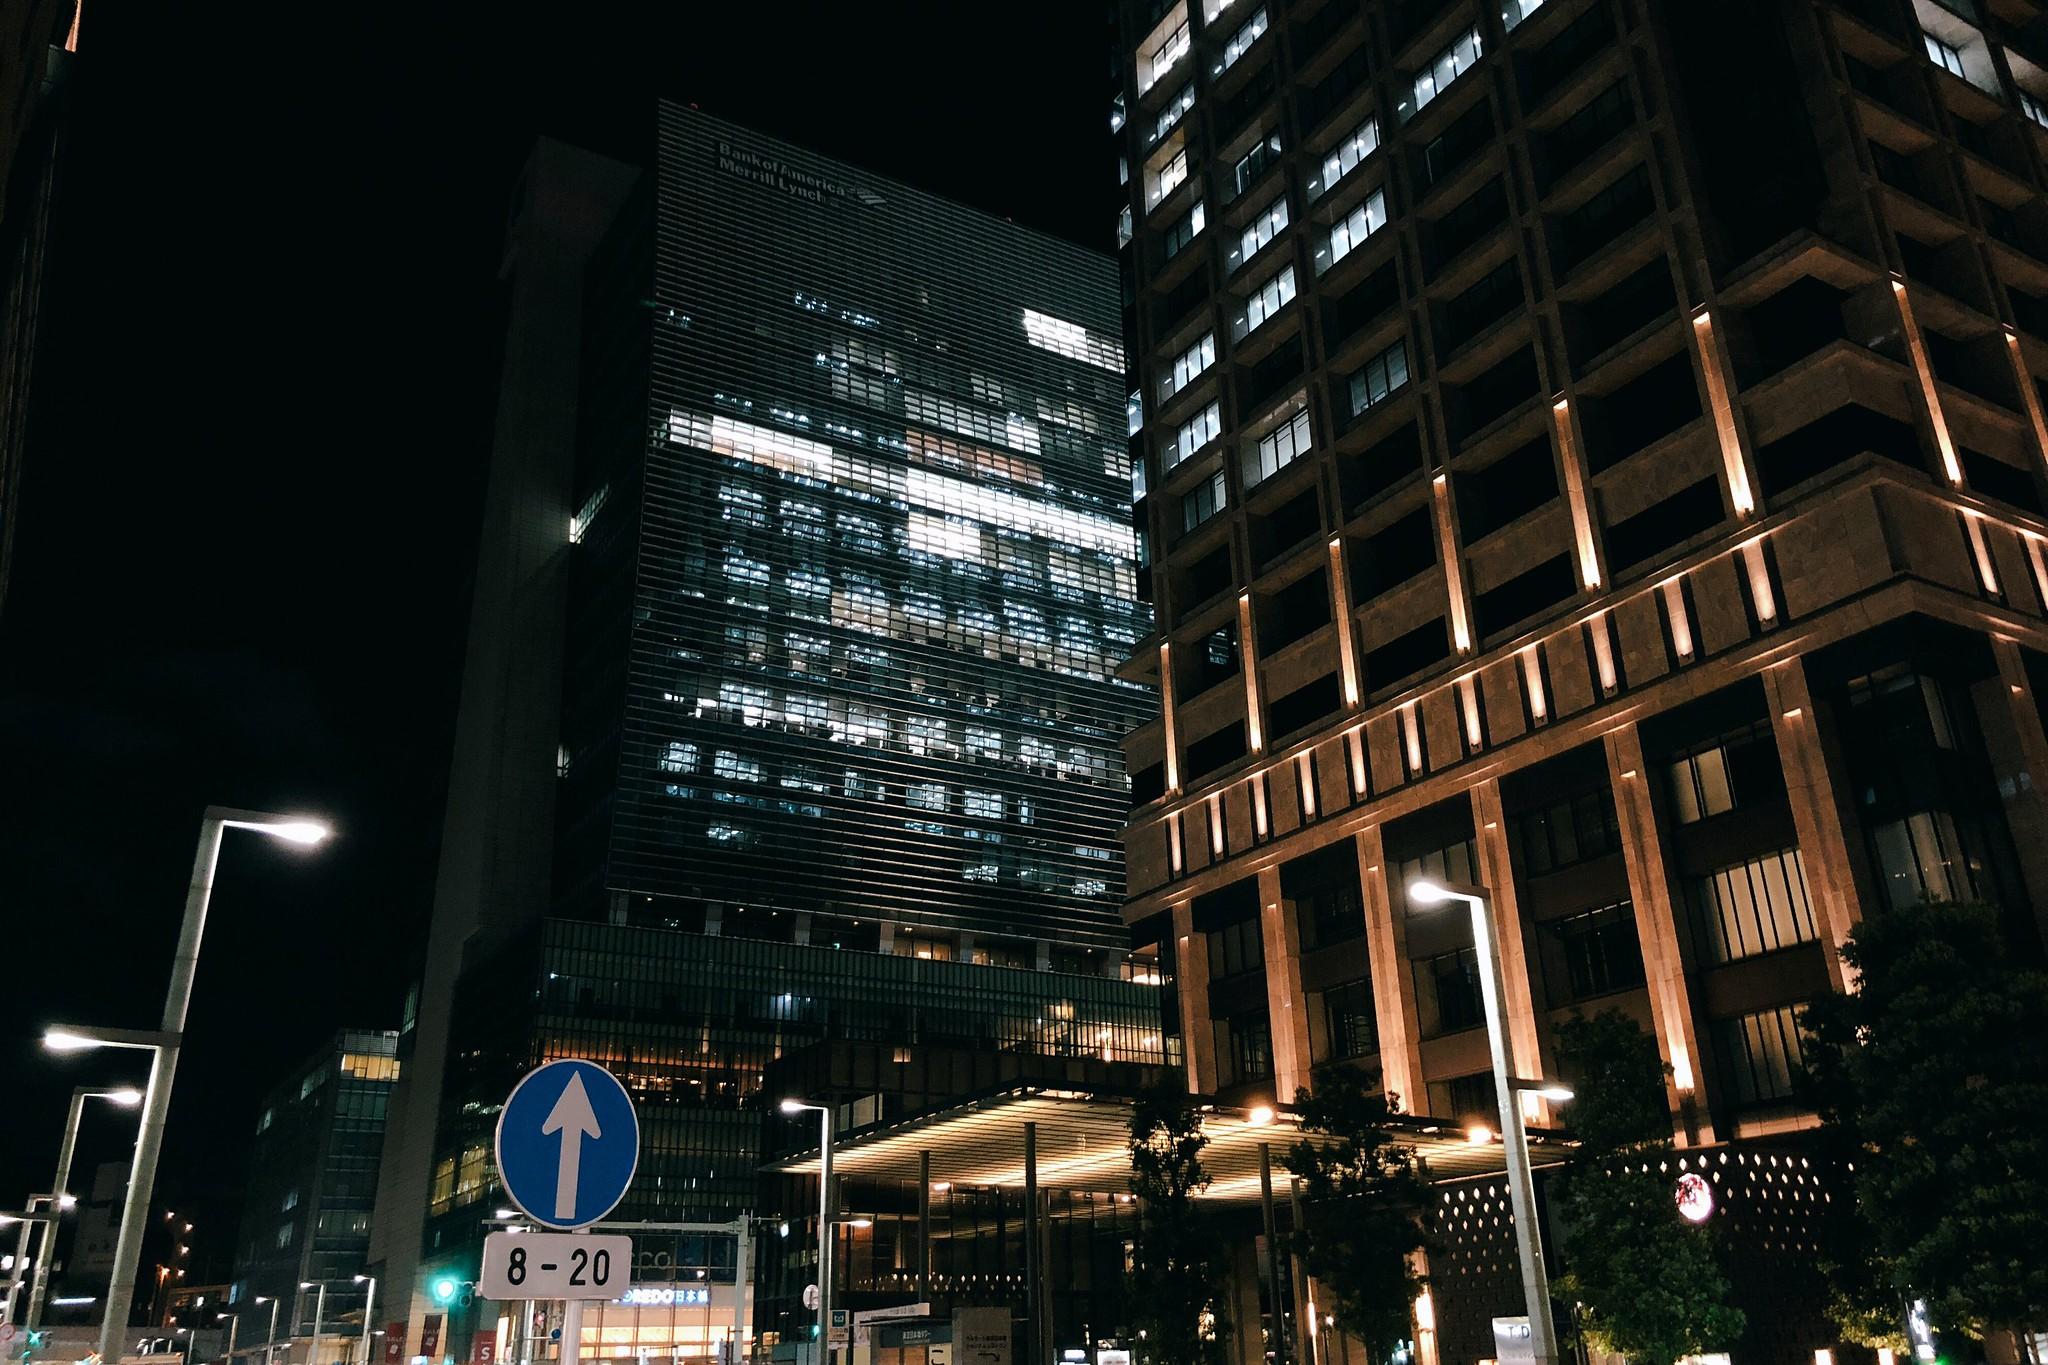 #Tokyo Nihonbashi. #iPhoneX #Shotoniphone #iPhone #Halide #Apple #RNIFilms #FujiPro160NS# #Streetphoto #Japan